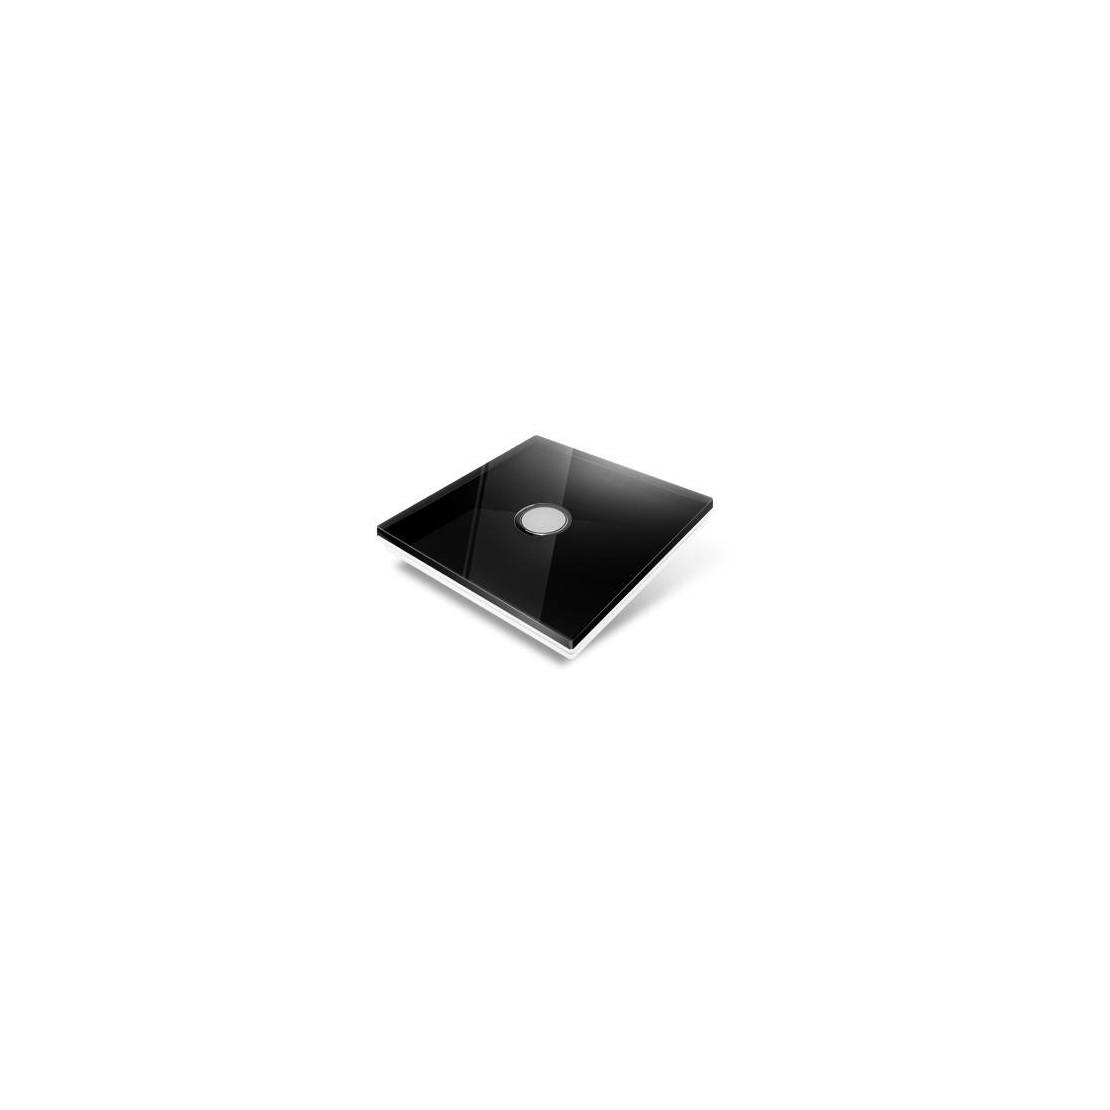 Tampa de cobertura para interruptor Edisio - cristal preto